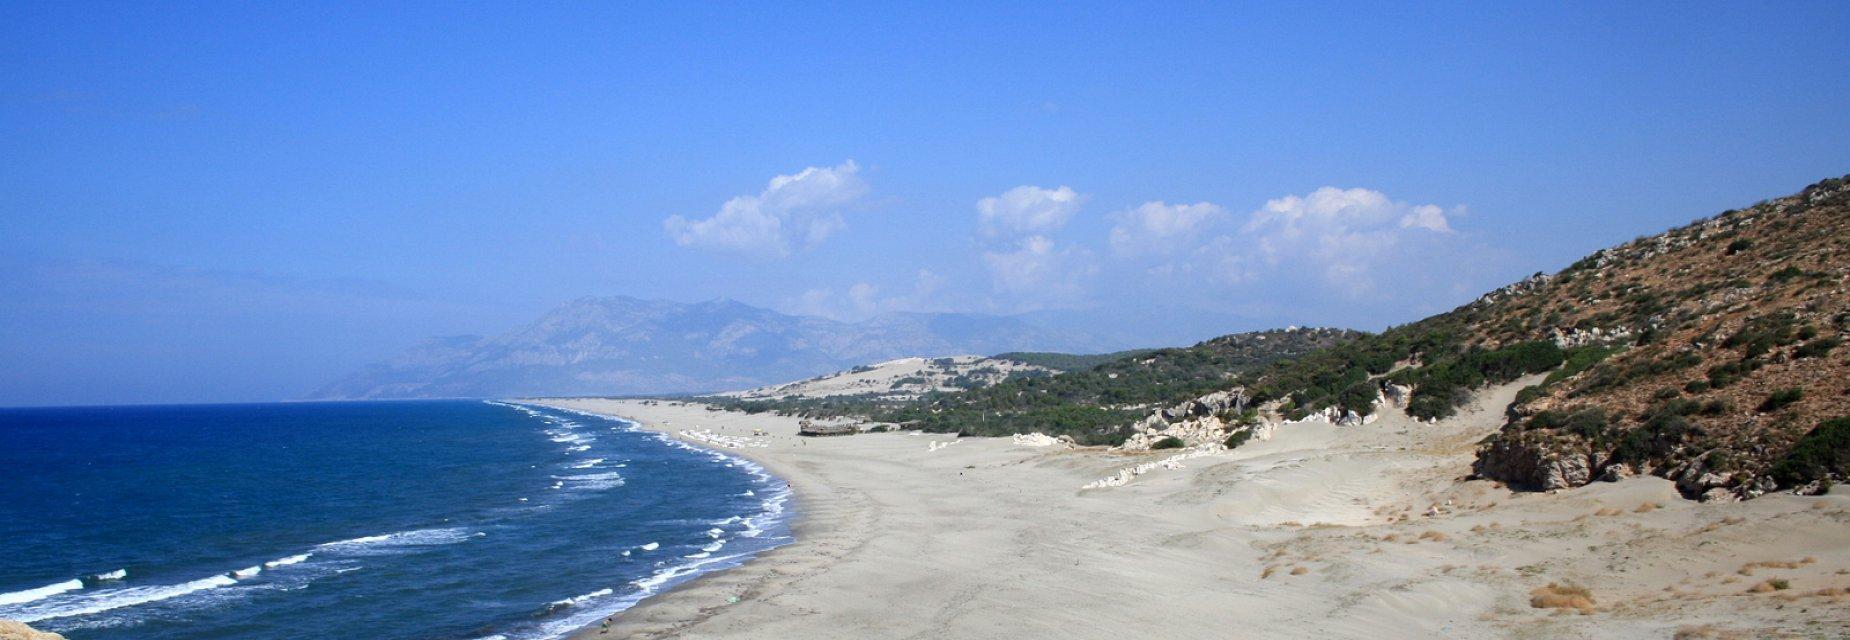 شاطئ باتارا Patara Beach